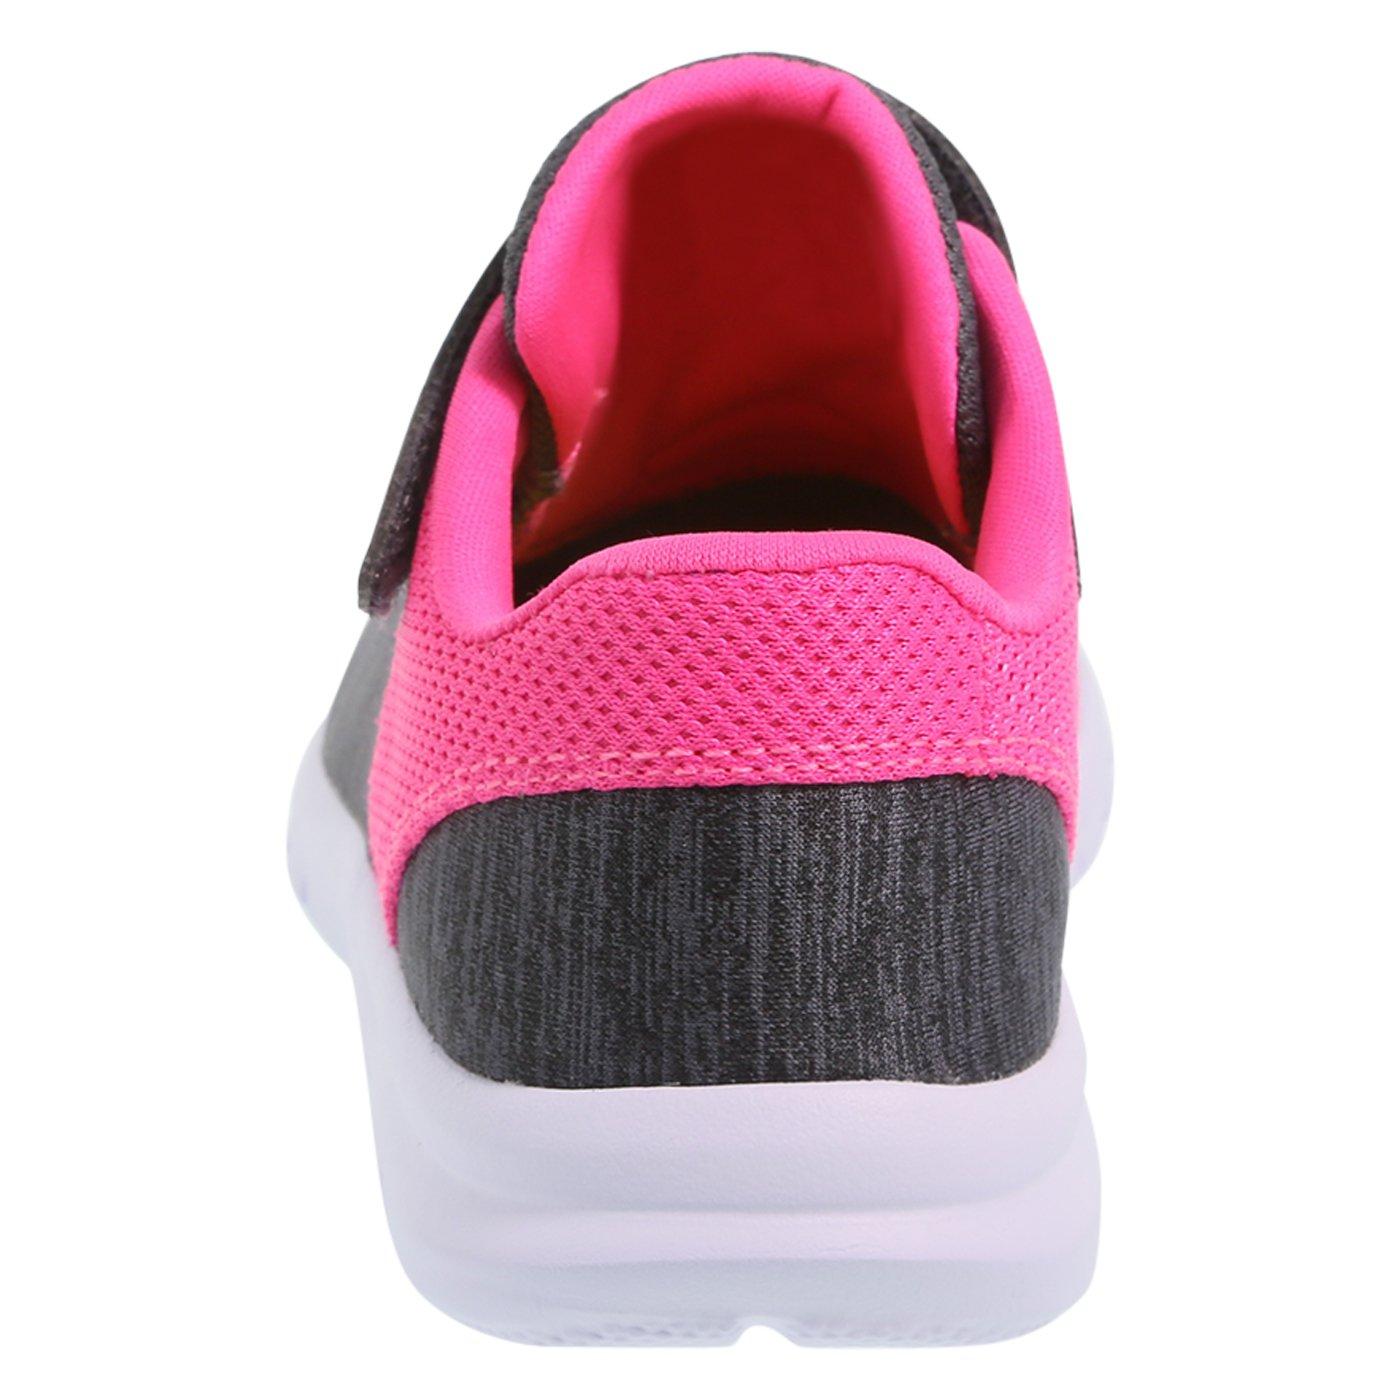 efa678990ab Mua sản phẩm Champion Girls  Toddler Strap Gusto Cross Trainer từ Mỹ ...